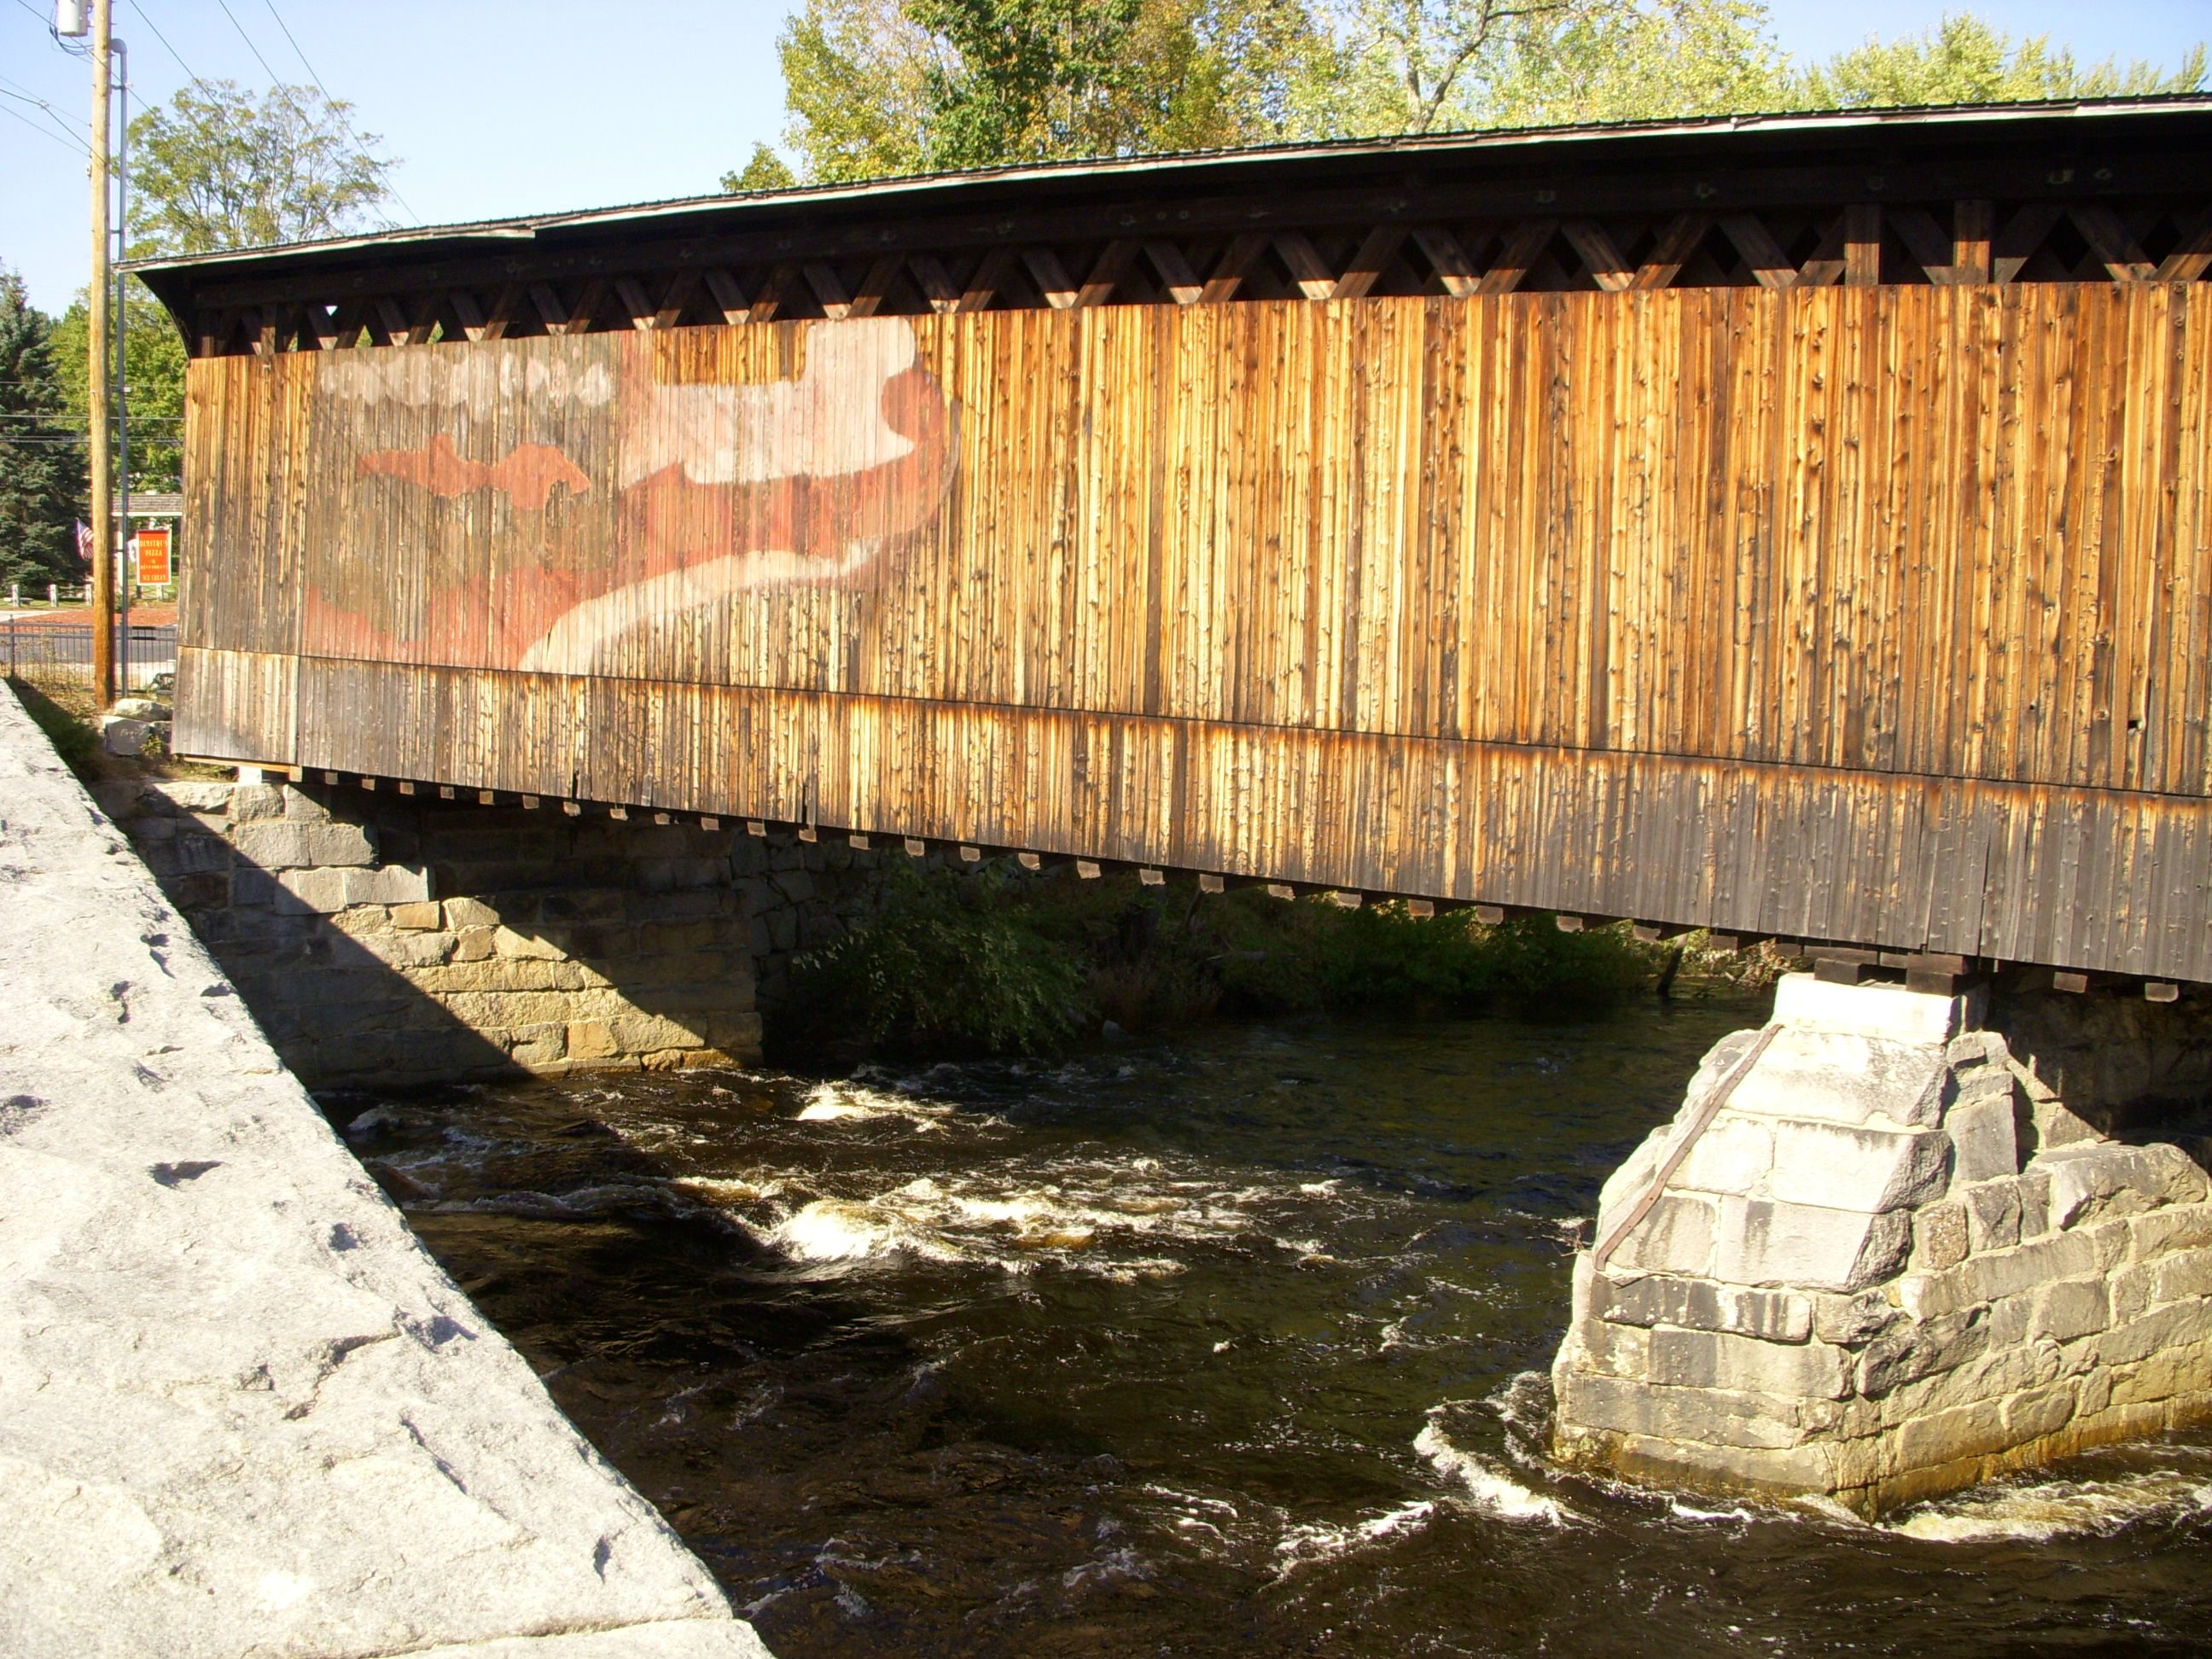 Covered Railroad Bridge in NH